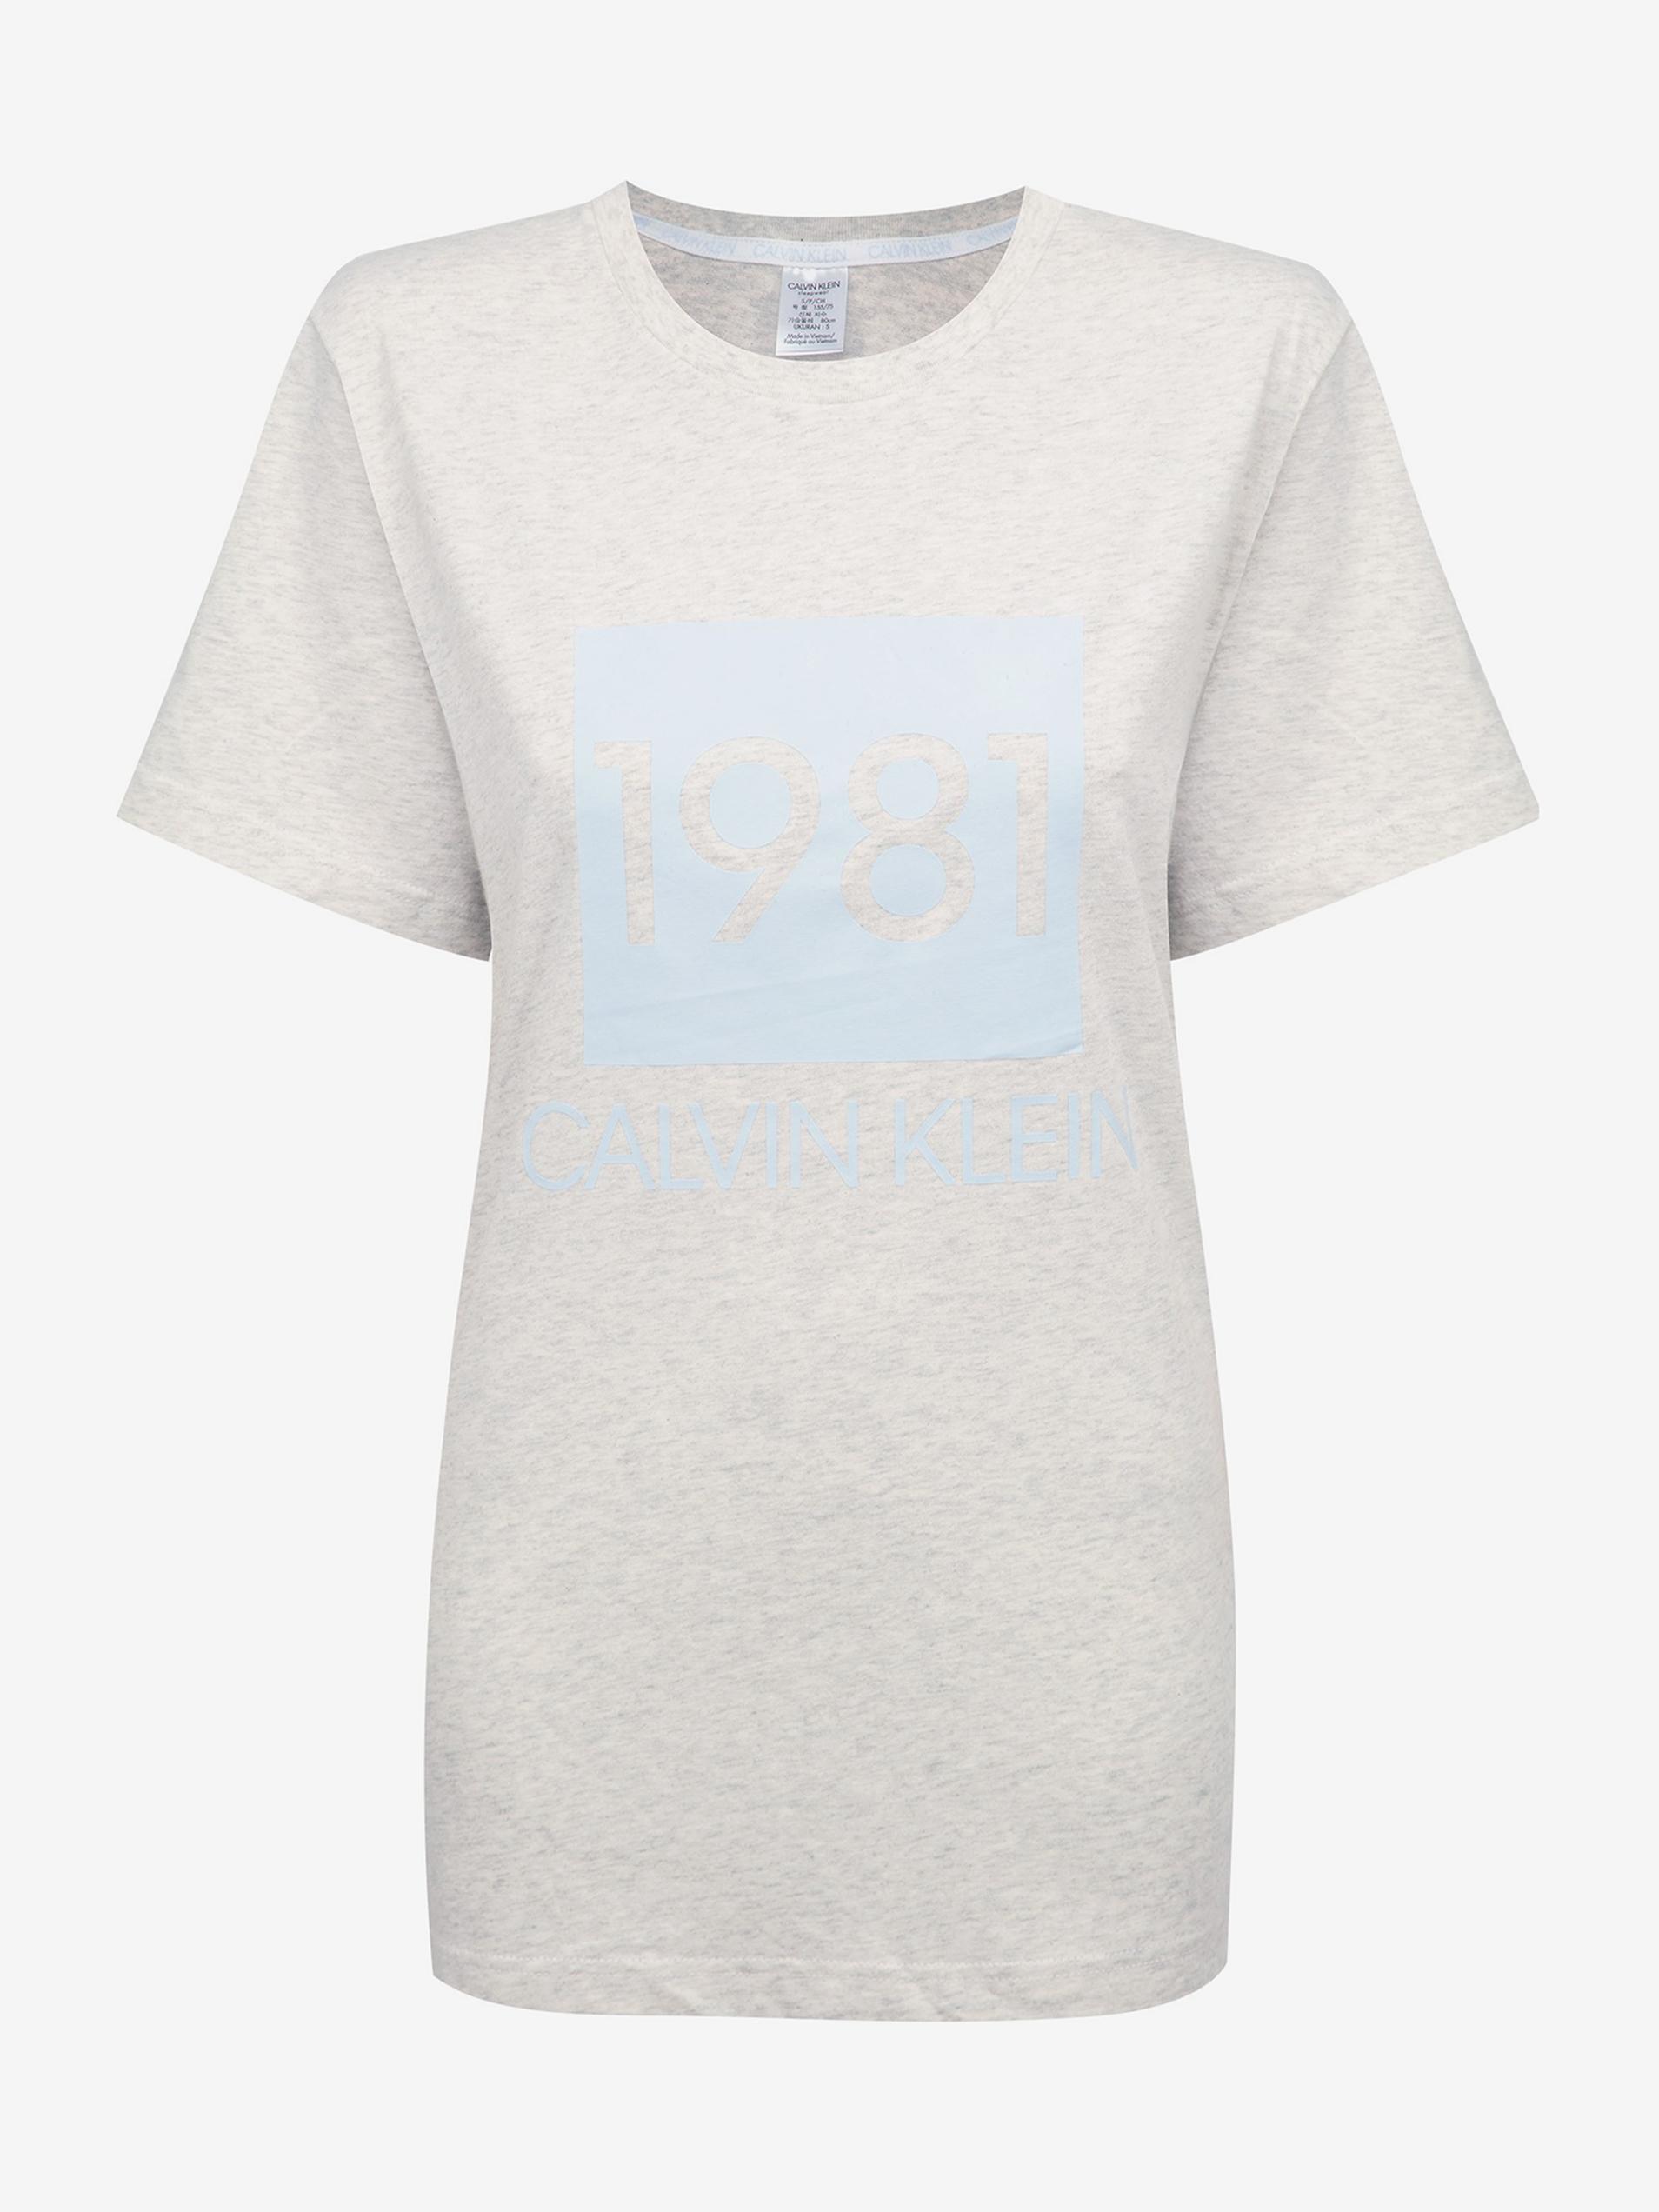 Calvin Klein grey women´s T-shirt S/S Crew Neck with logo